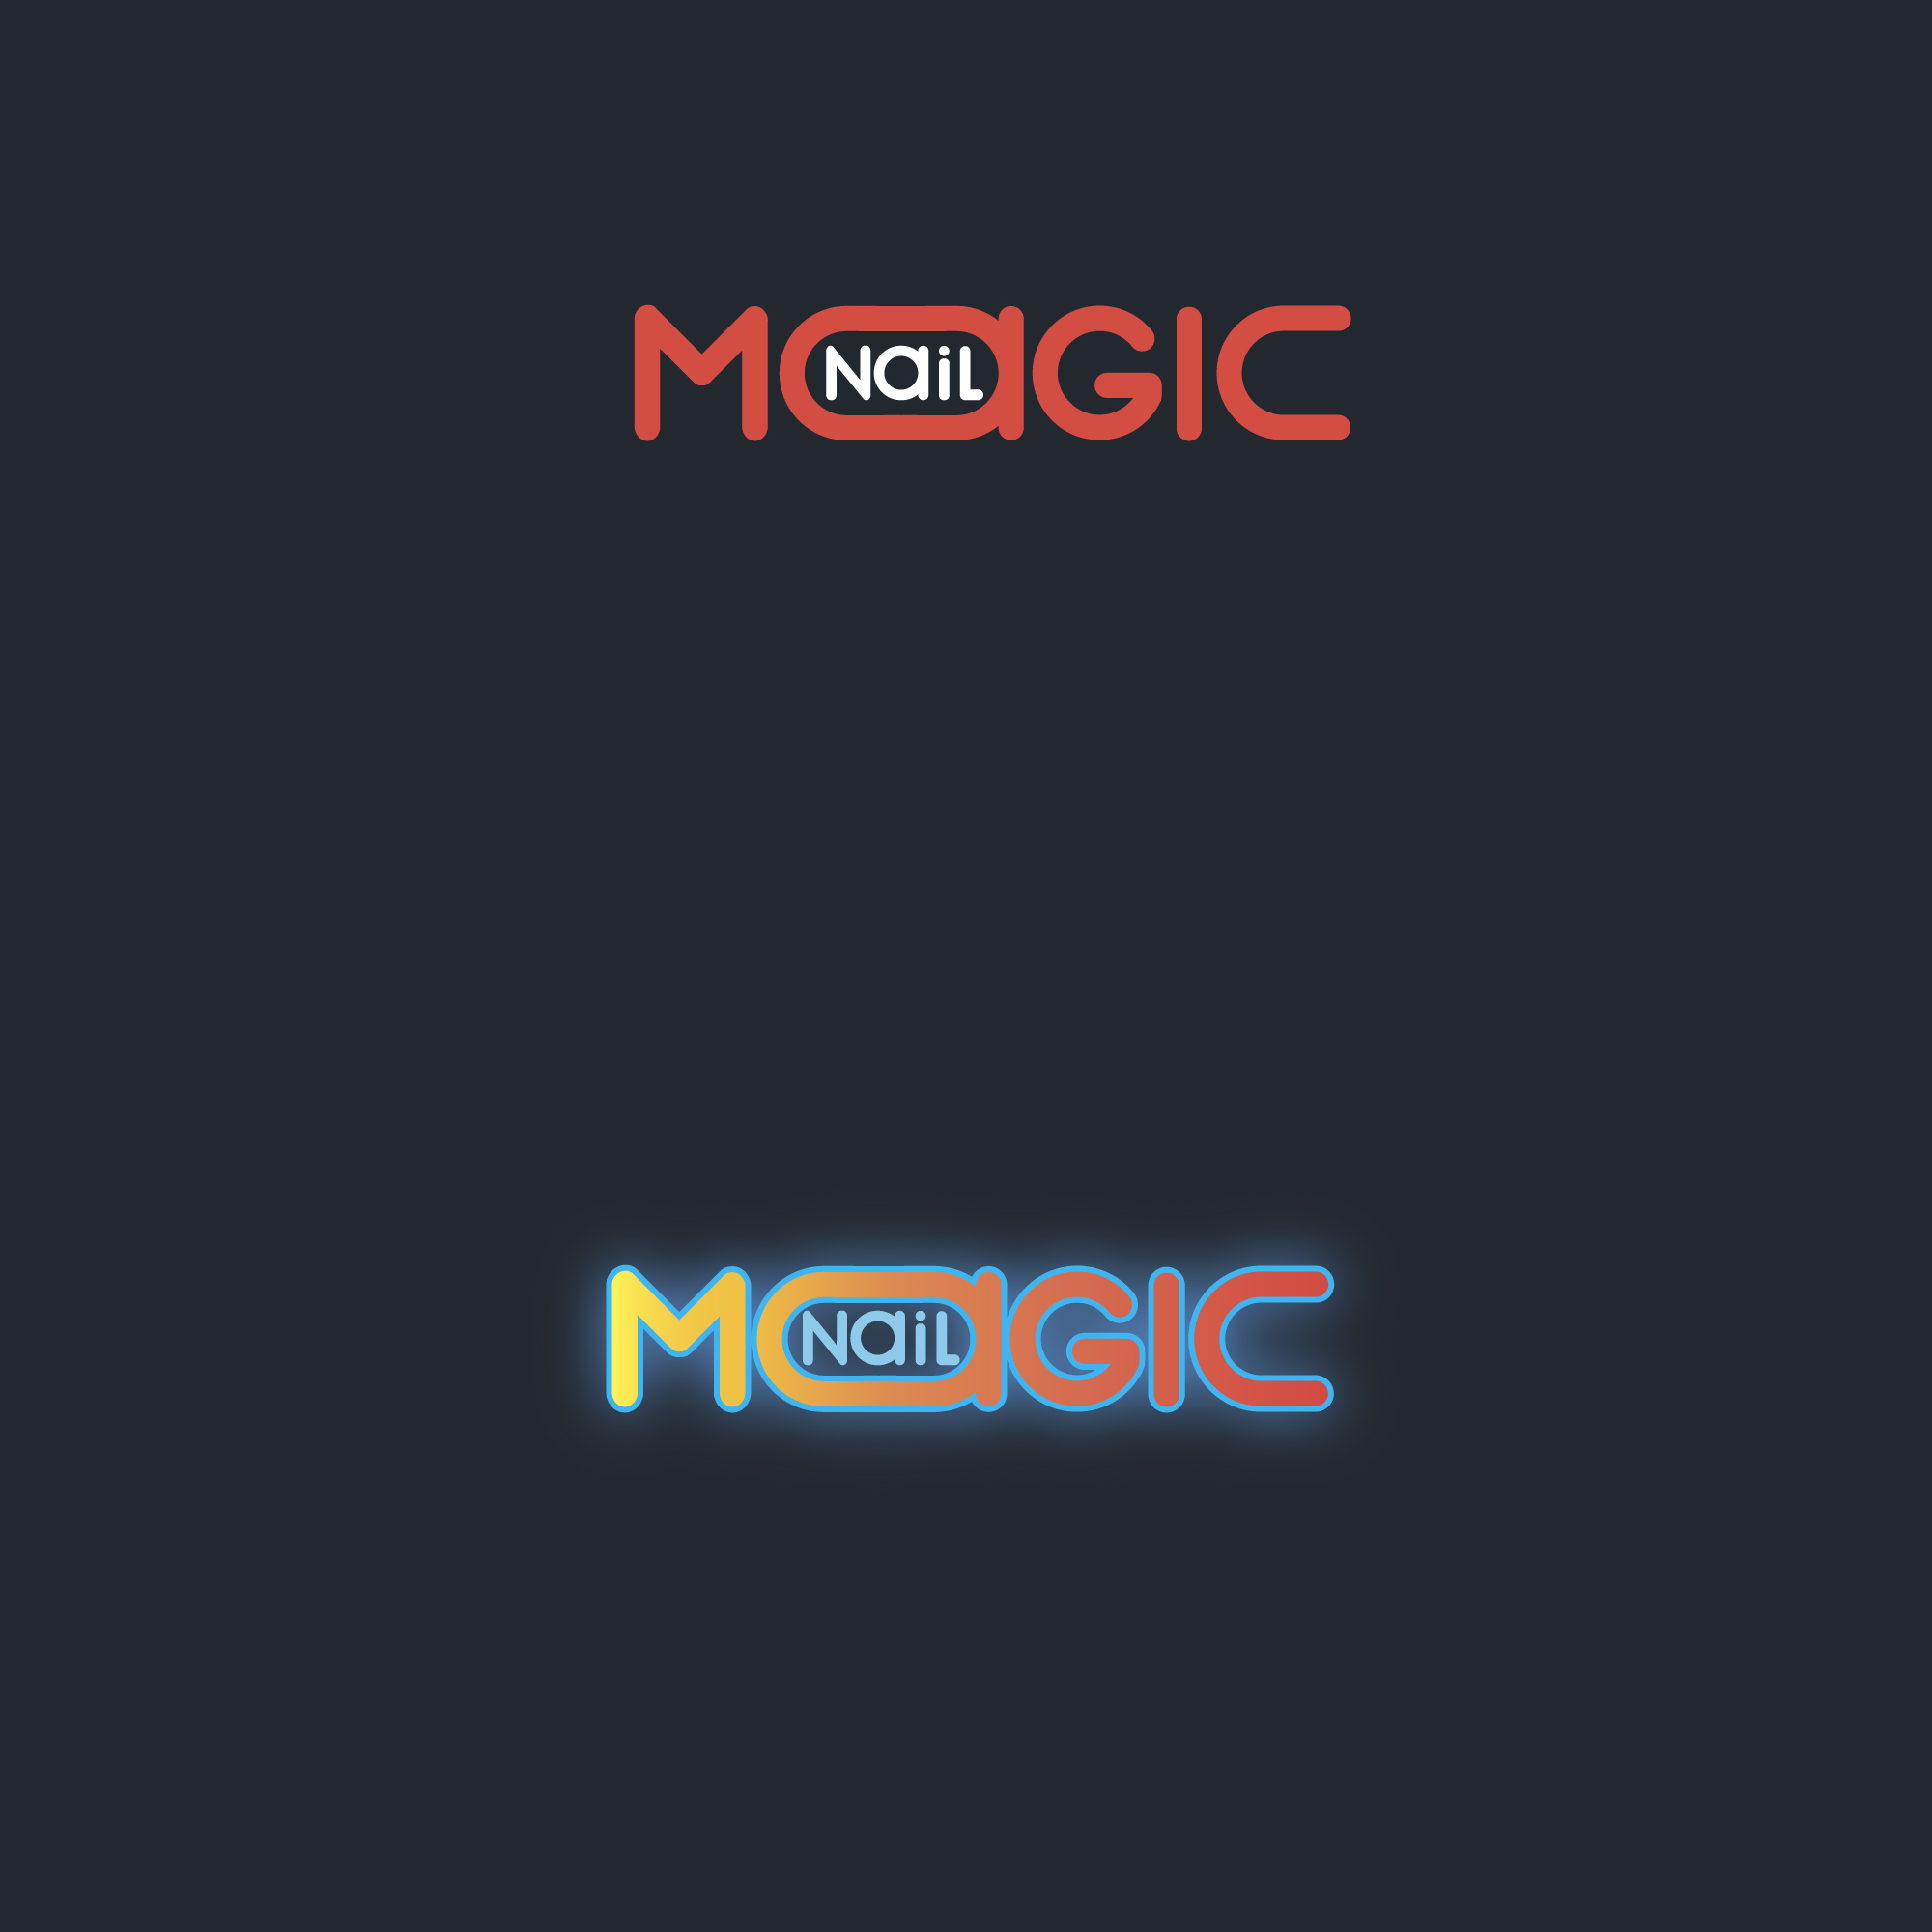 Дизайн этикетки лака для ногтей и логотип! фото f_1775a0dbd6b28e49.jpg